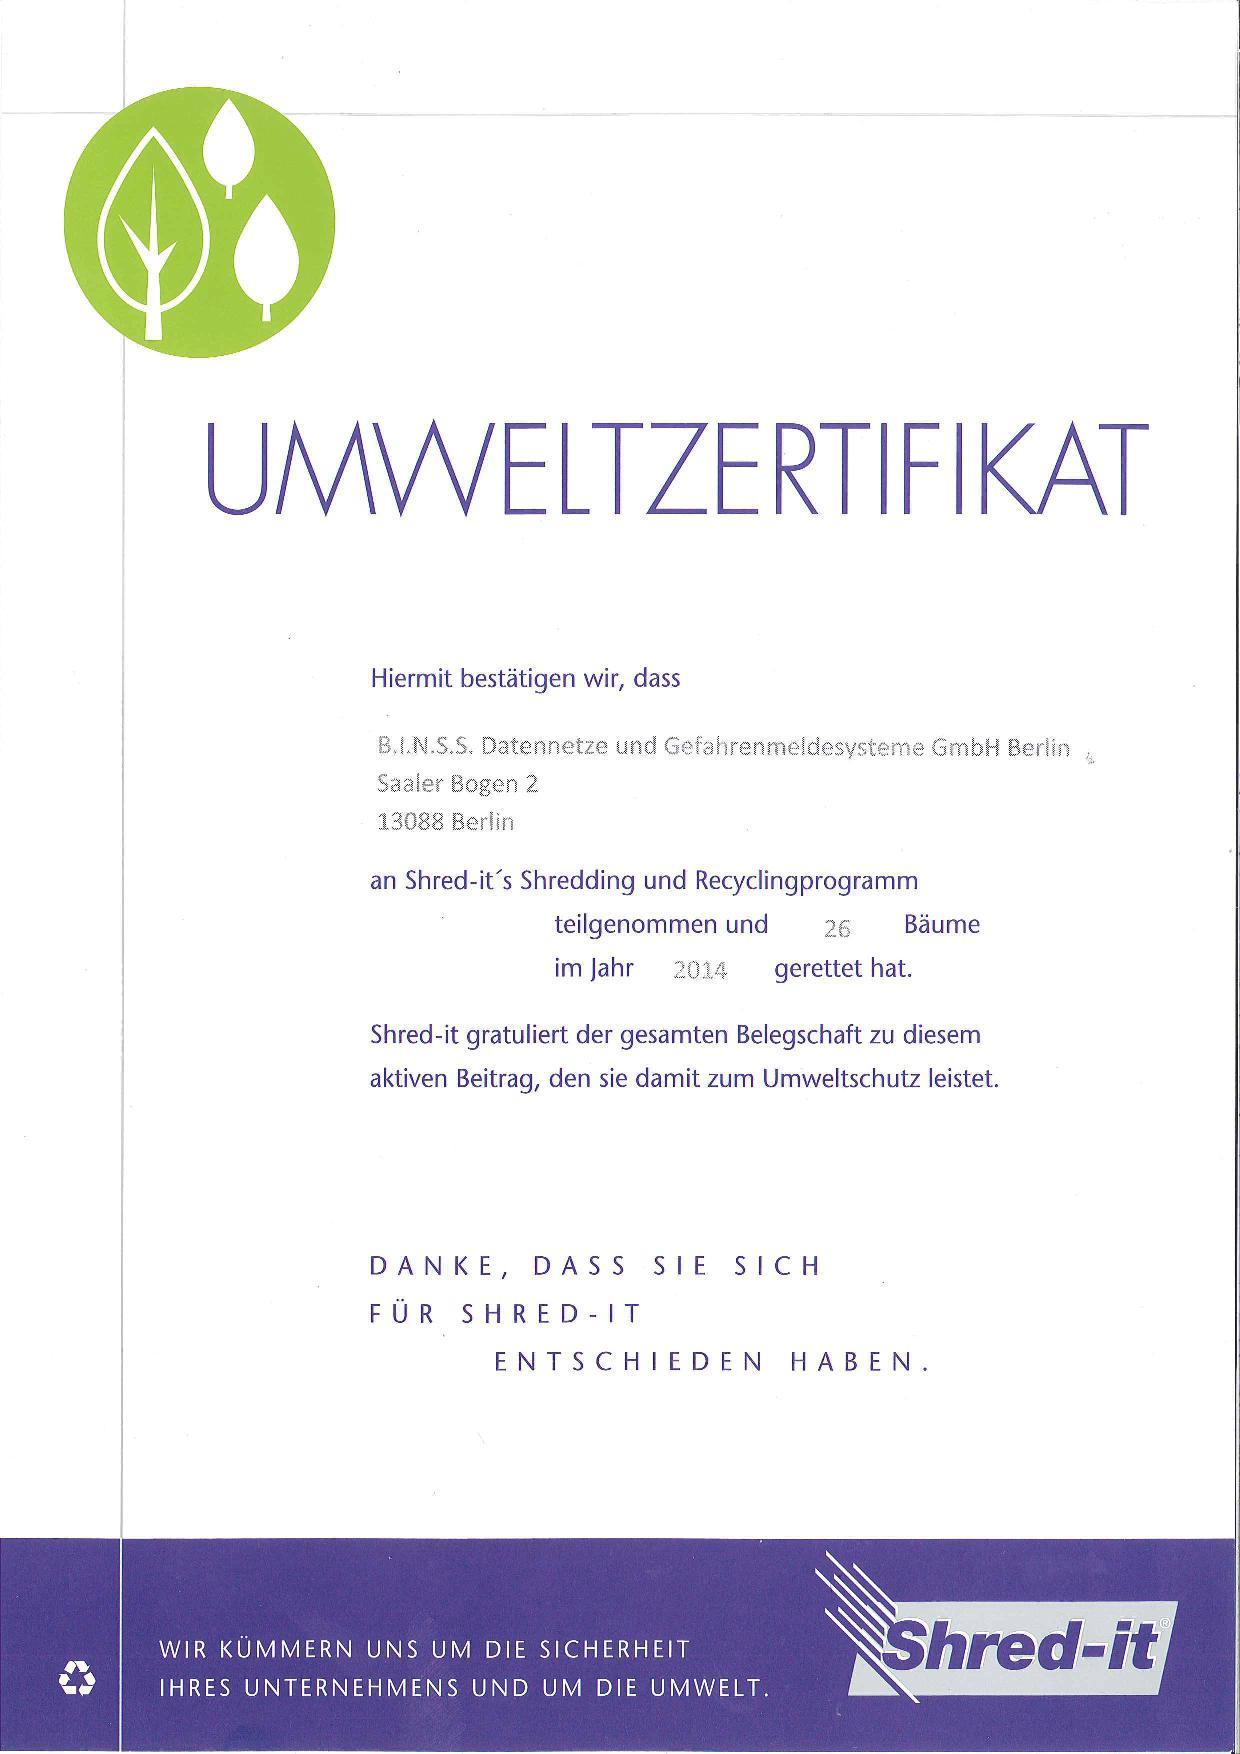 Shred-It Umweltzertifikat 2014